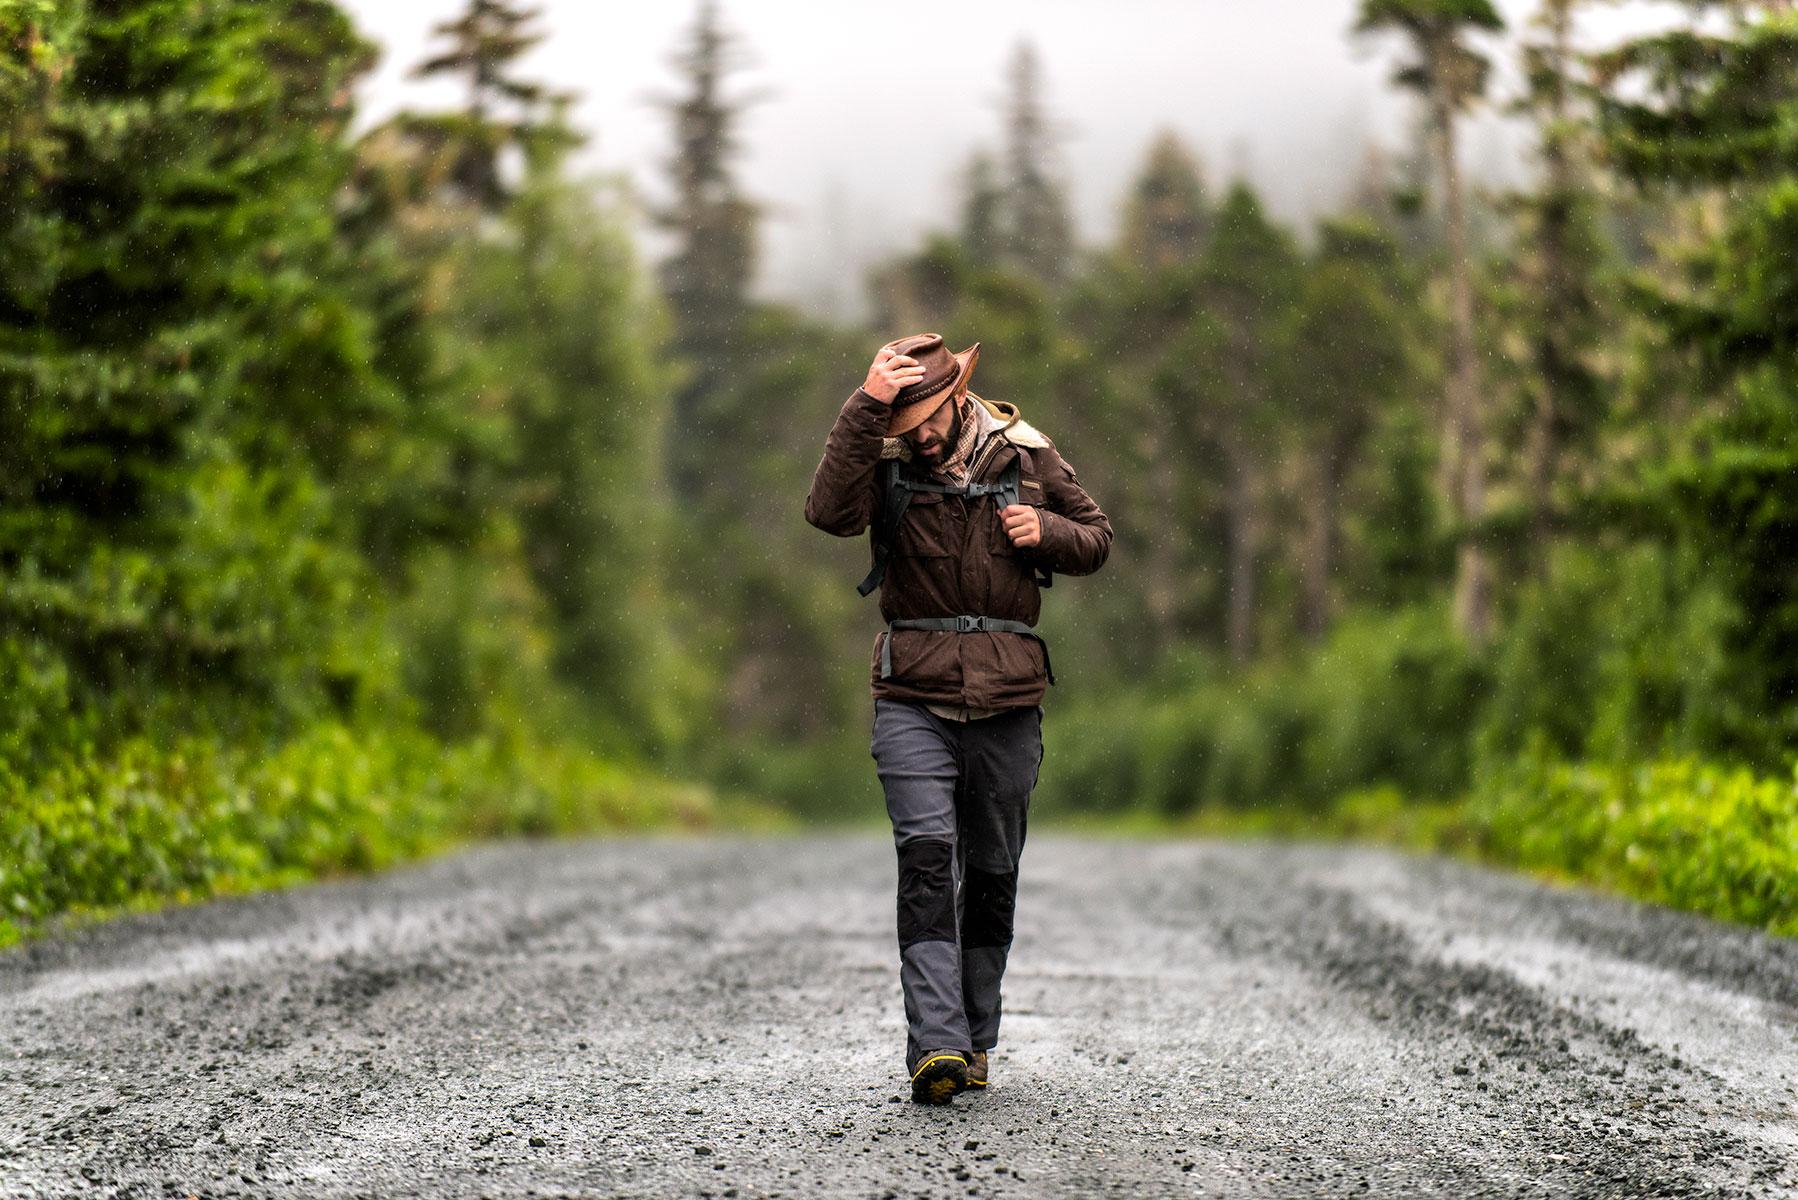 austin-trigg-brave-wilderness-alaska-Coyote-Walks-Dirt-Road.jpg